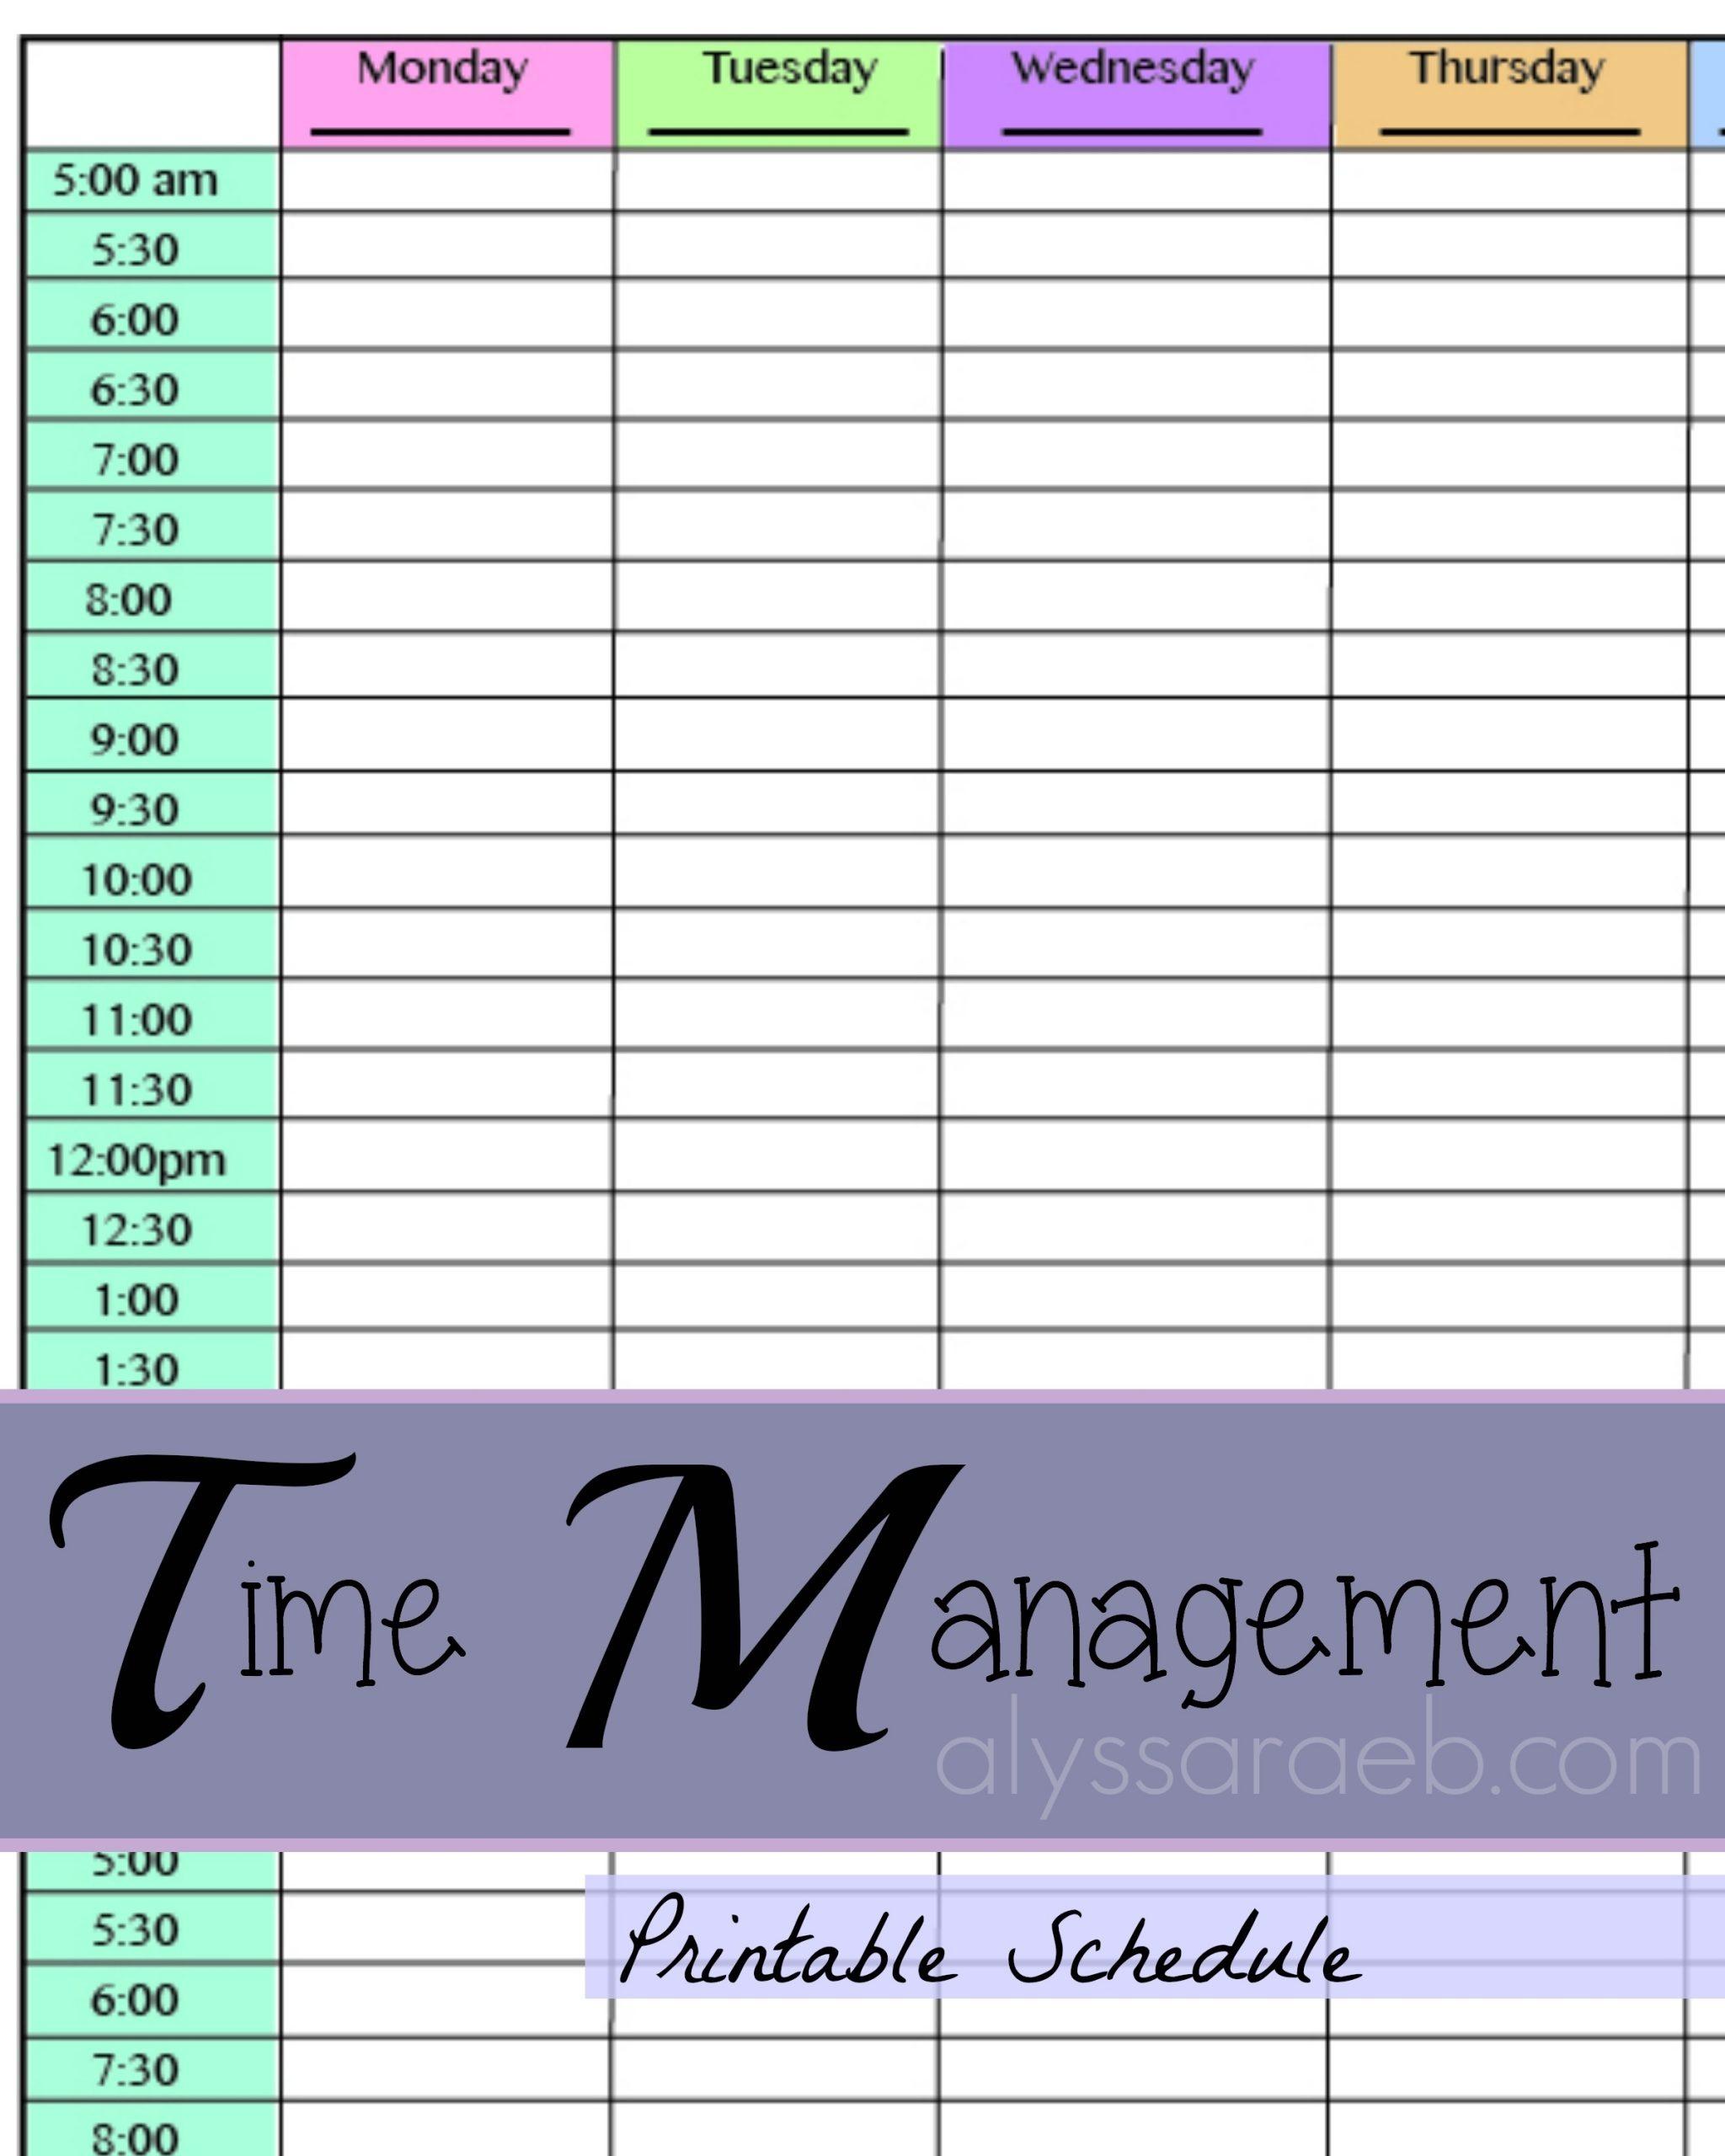 Time Management: Printable Schedule – Alyssa Rae